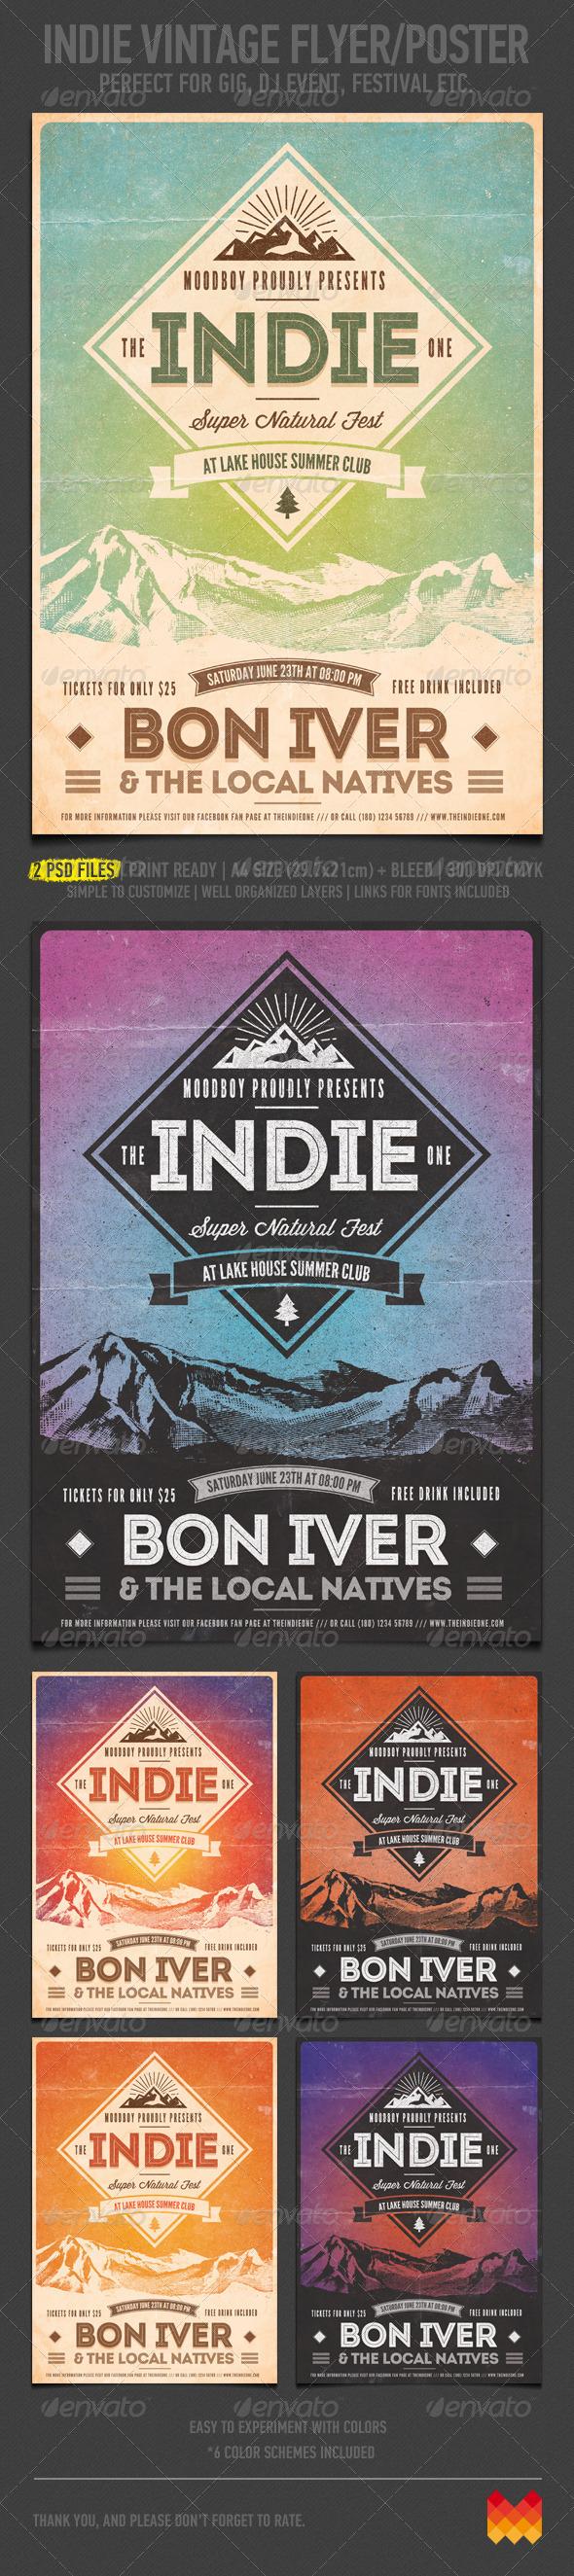 GraphicRiver Indie Vintage Flyer Poster 4705761